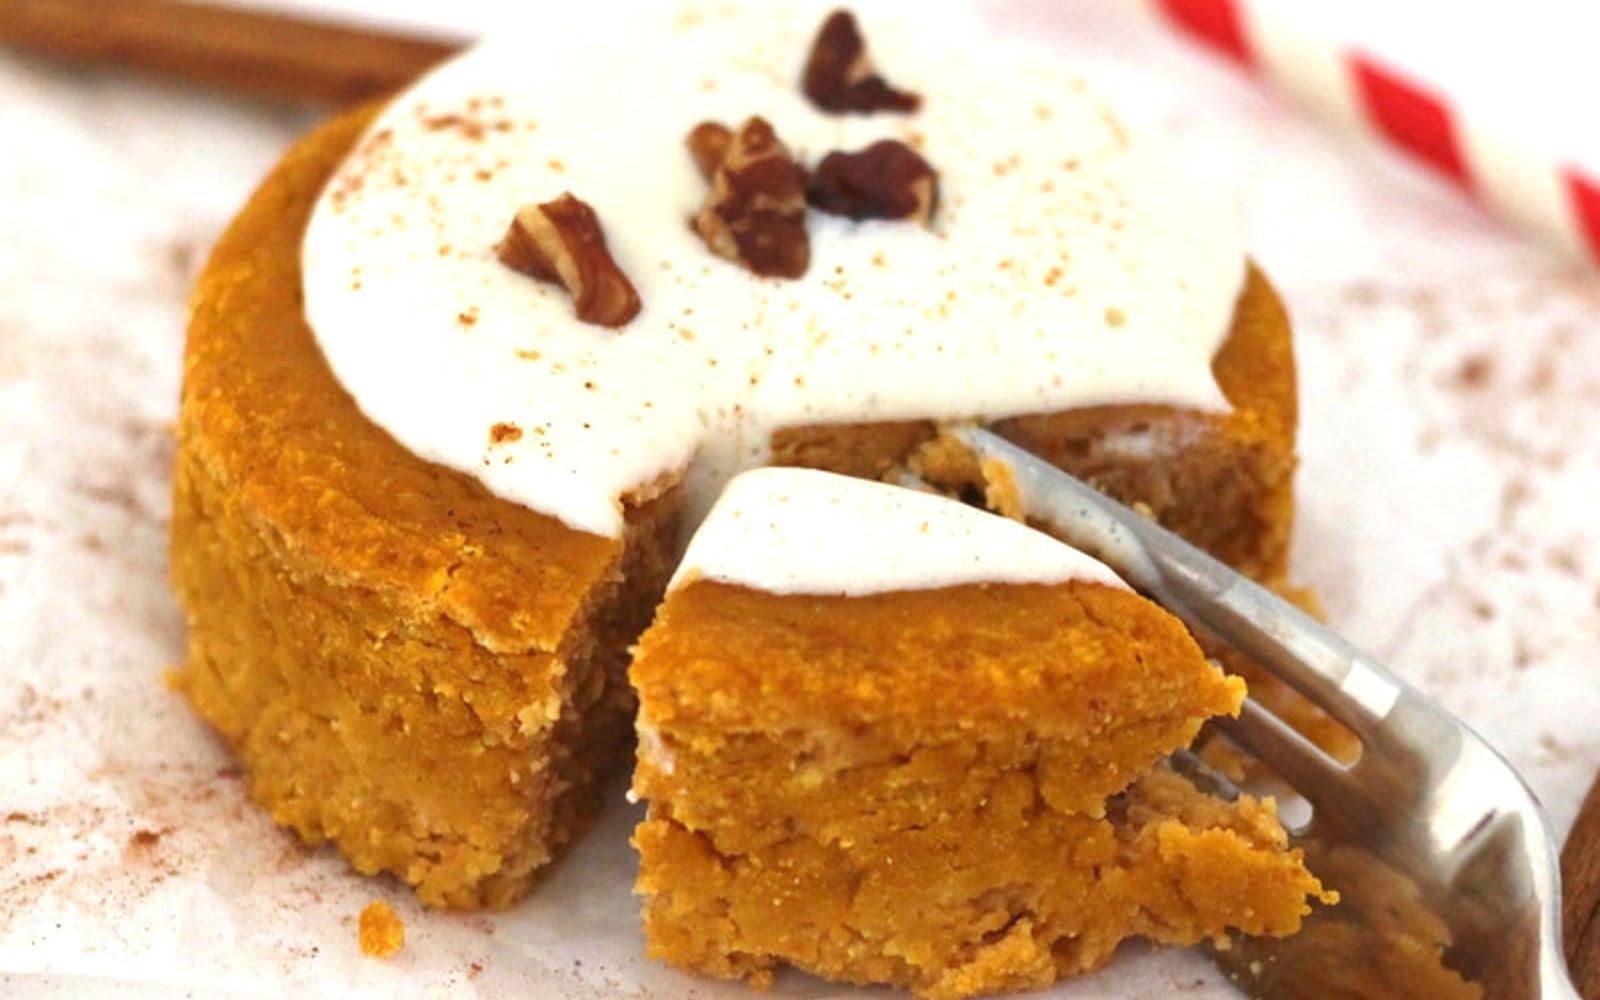 Vegan Gluten-Free Oil-free Pumpkin Spice Mug Cake with frosting